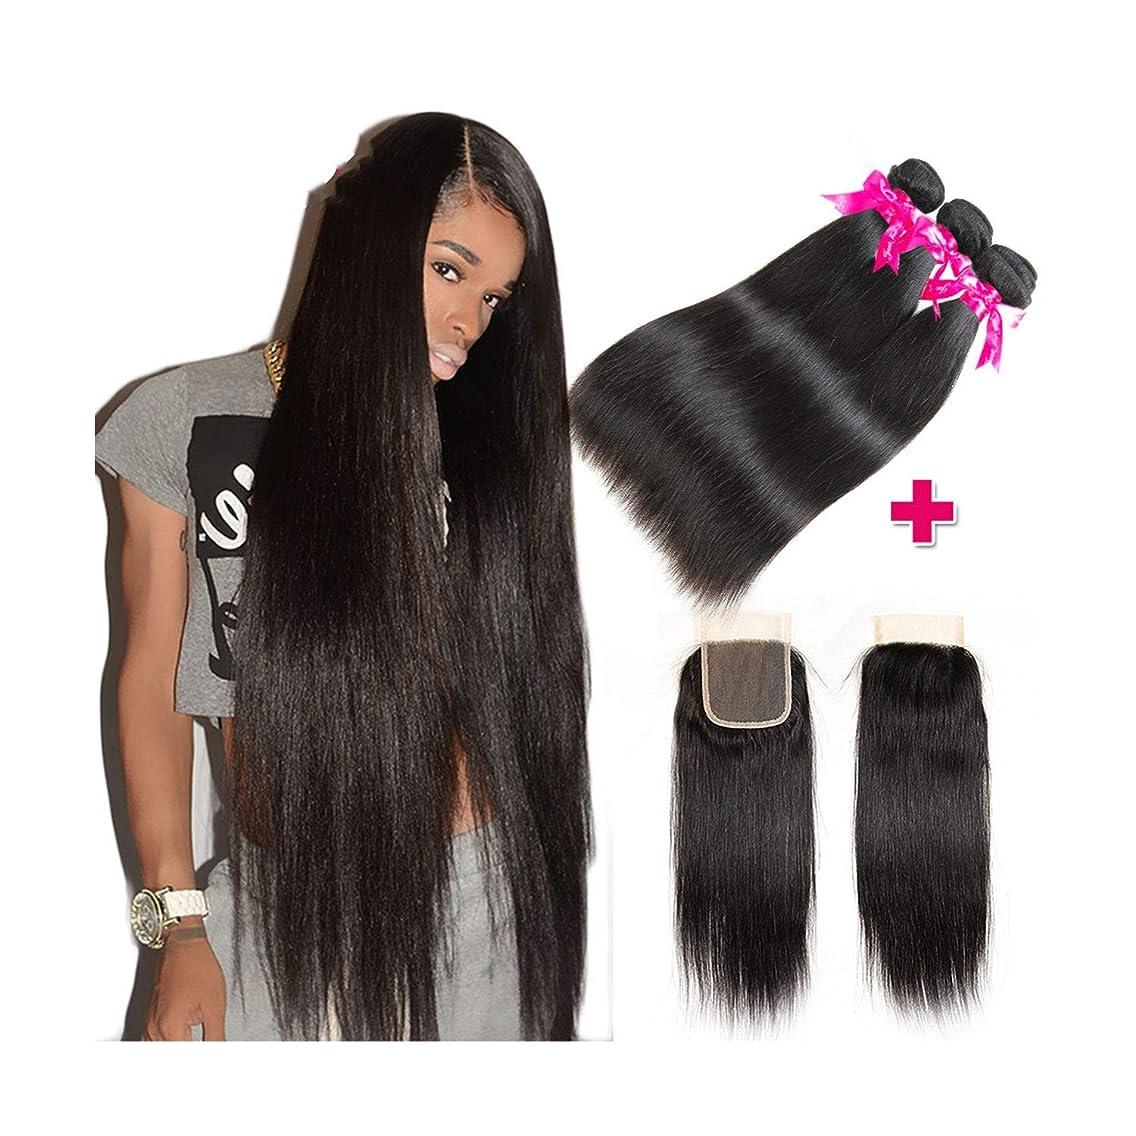 Body Wave Bundles With Closure Non- Human Hair Bundles With Closure Brazilian Hair Weave Bundles With Closure,26 26 26 & Closure20,Middle Part